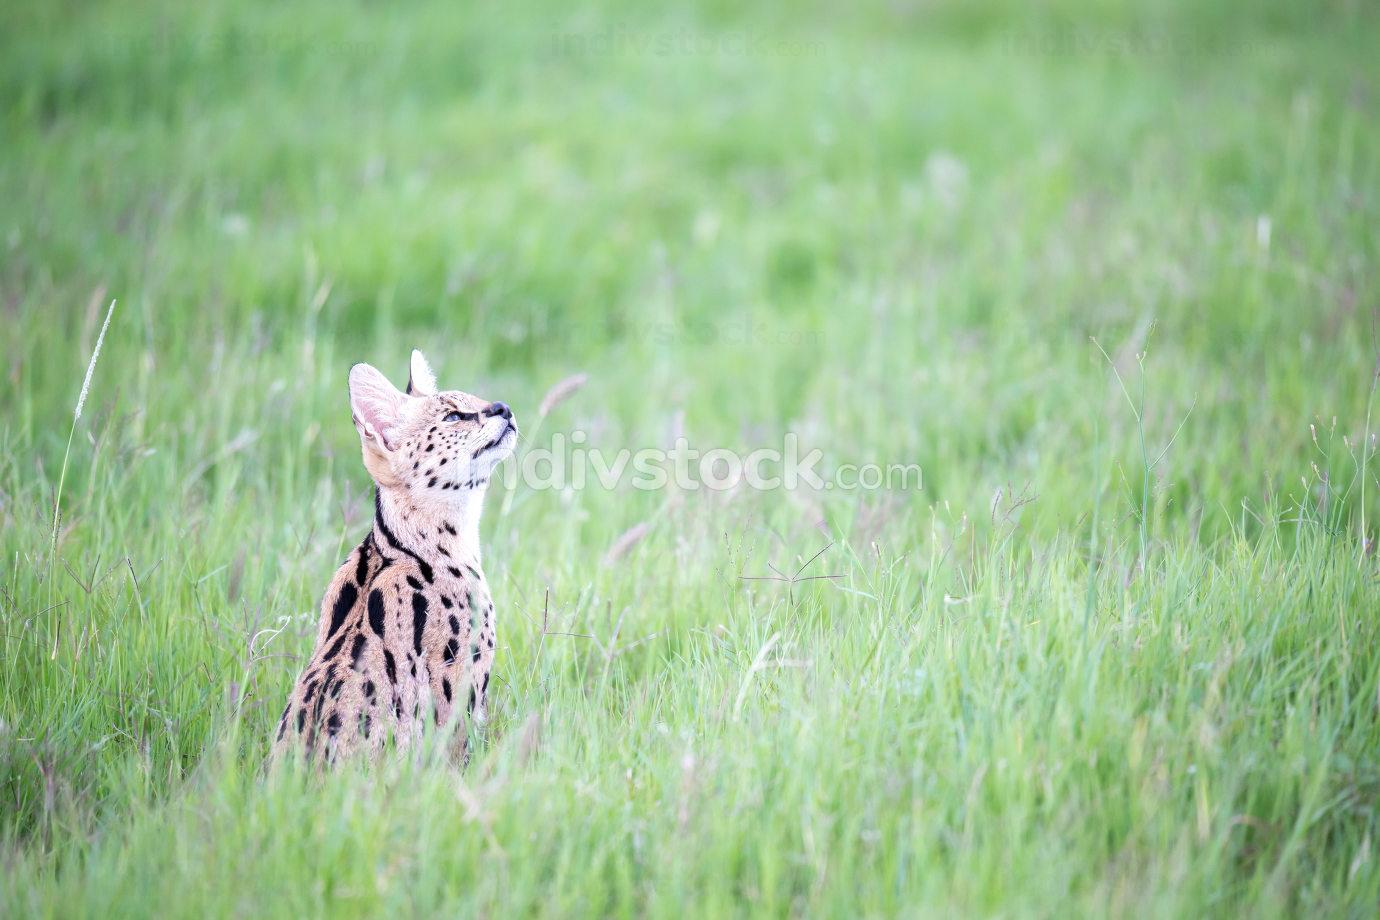 Serval cat in the grassland of the savannah in Kenya